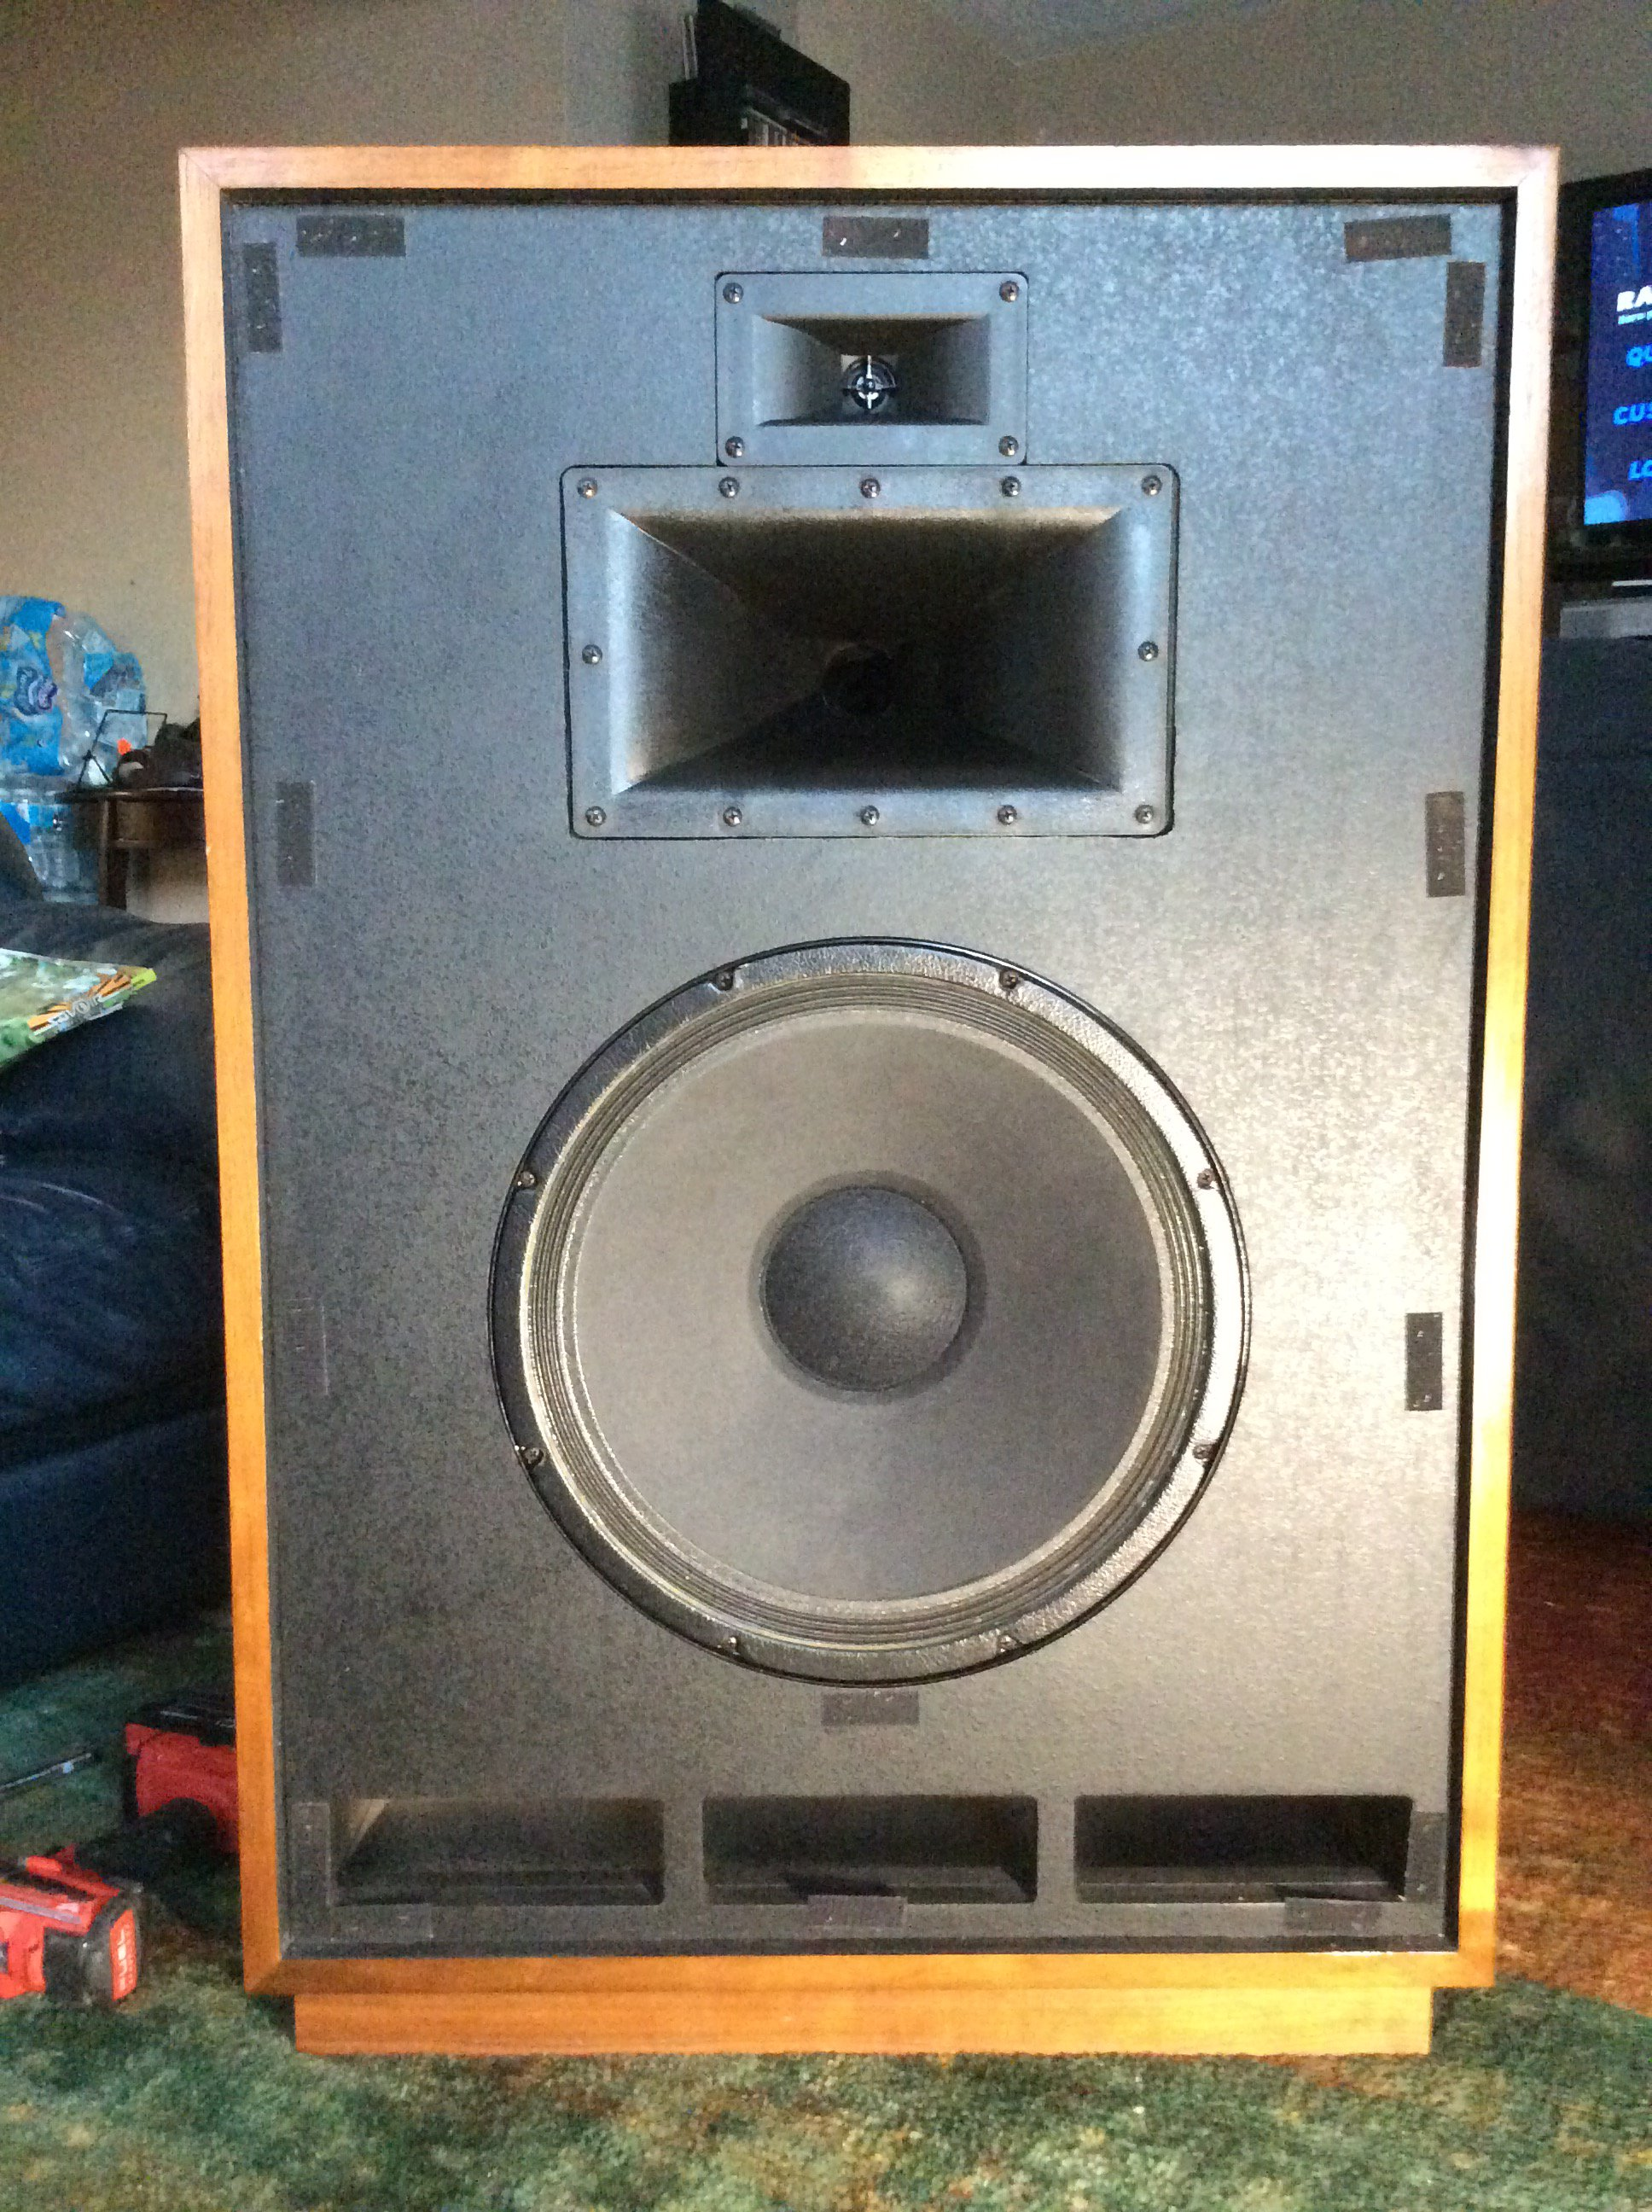 Dbx 1231: Technical/Modifications